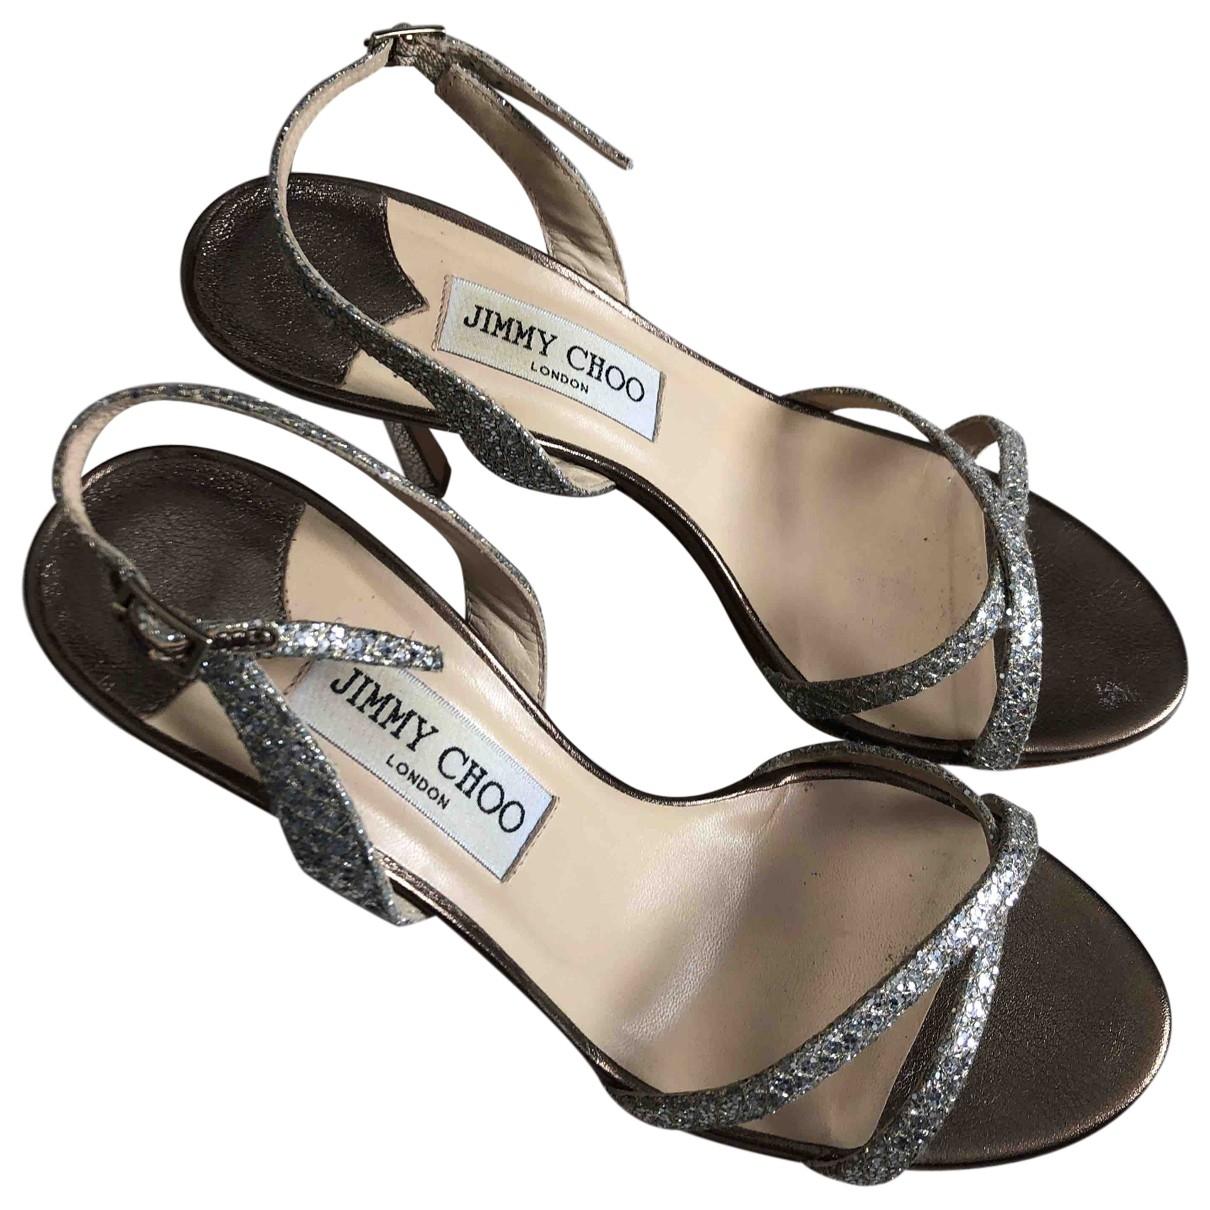 Sandalias de Con lentejuelas Jimmy Choo